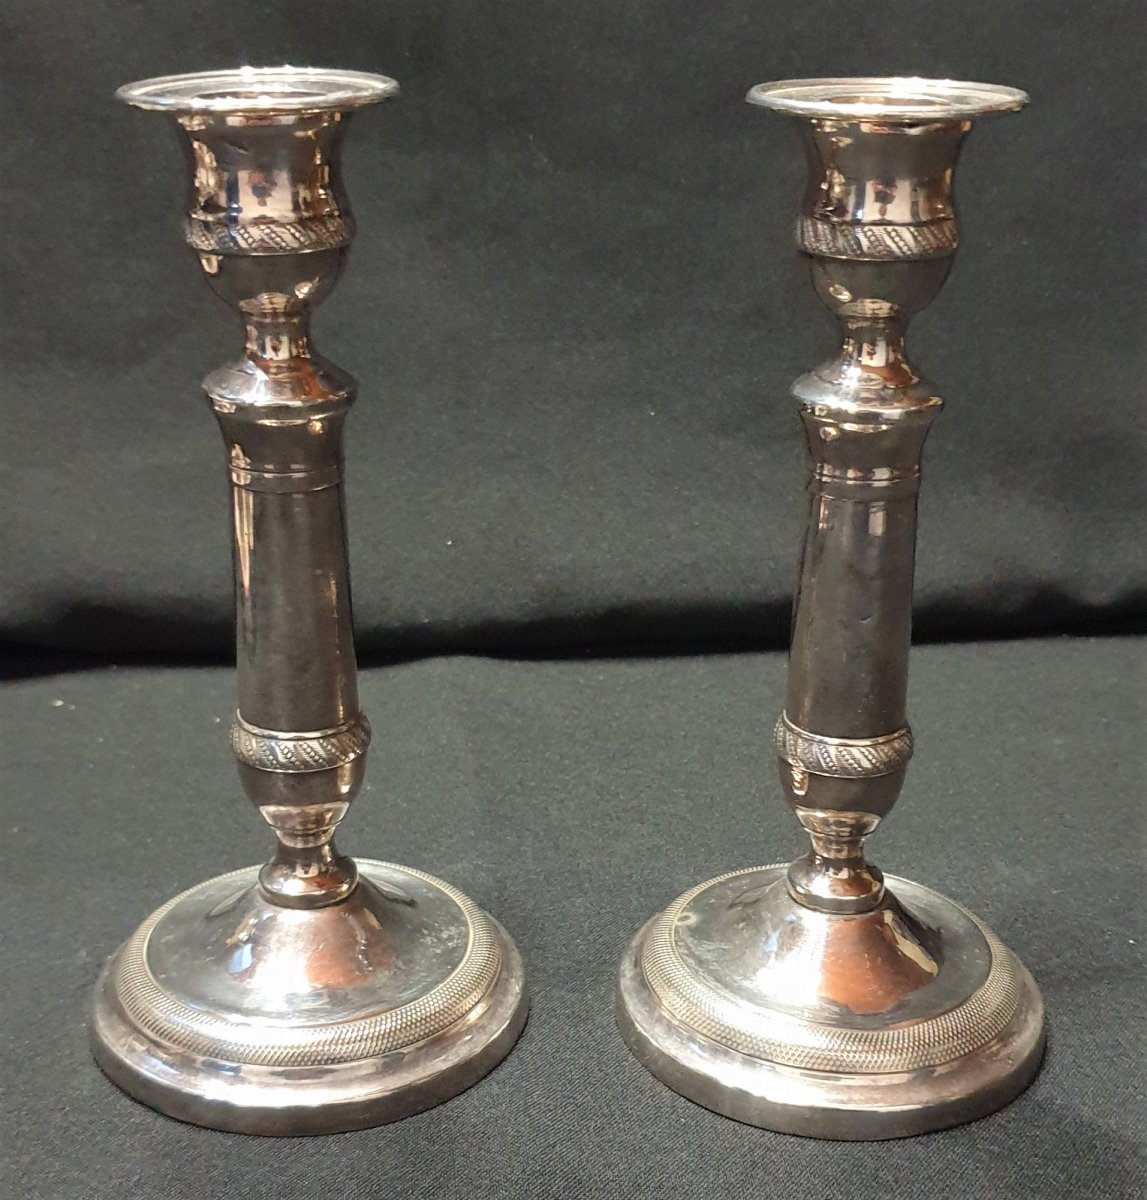 Pair Of Silver Candlesticks, Louis XVI Period